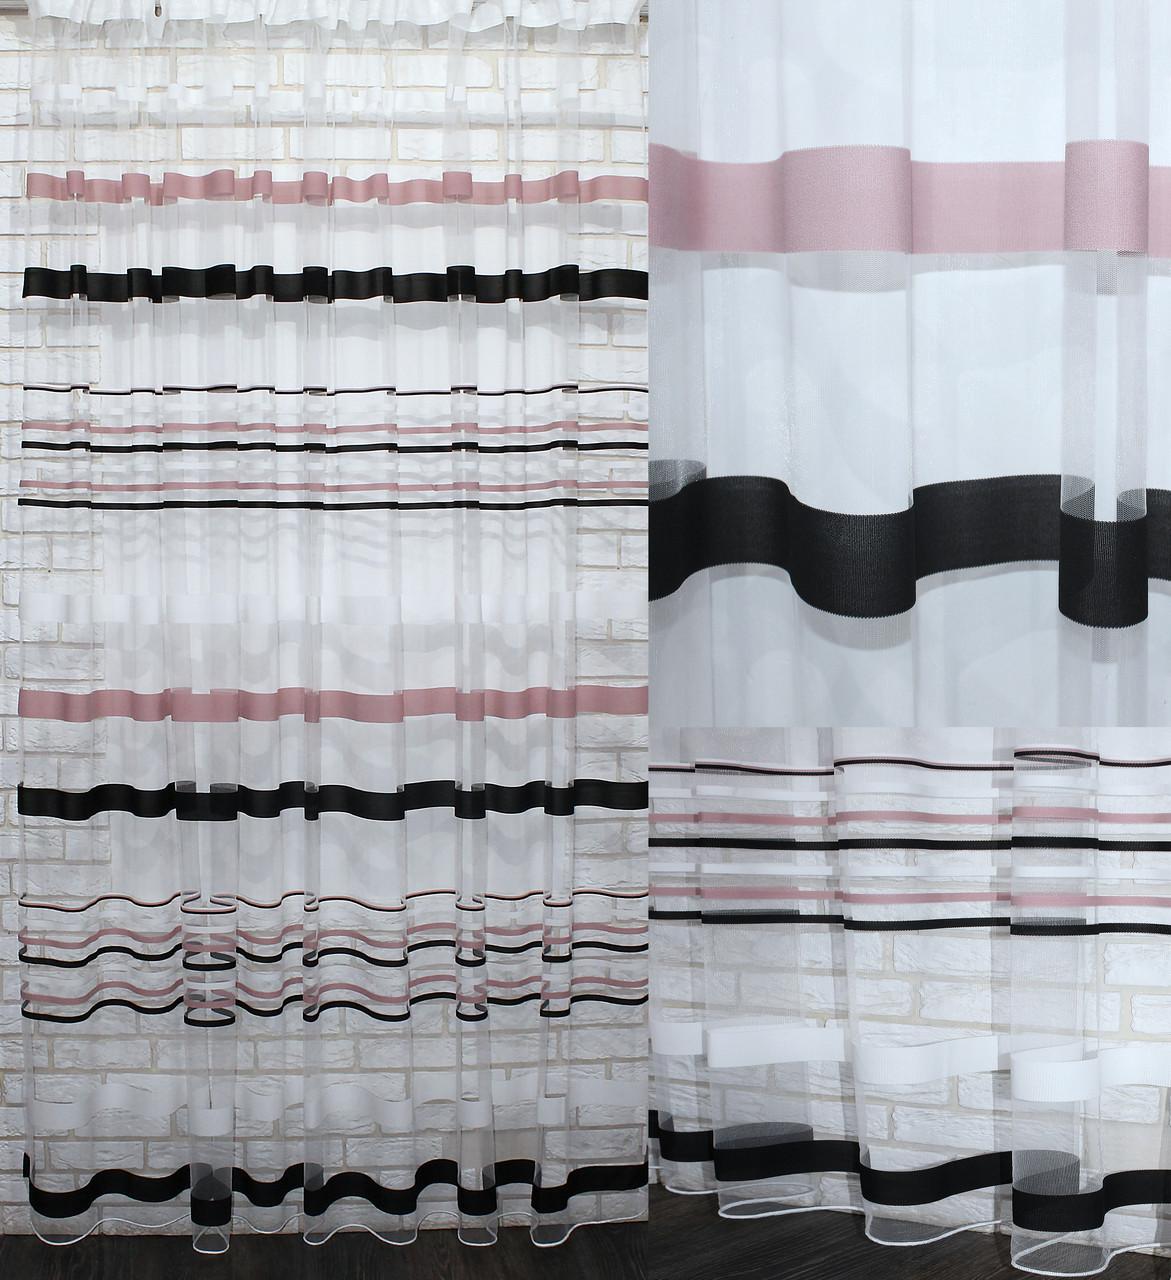 Тюль фатин полоса,(3х2,5) цвет пудра и чорный. Код 522т 40-179